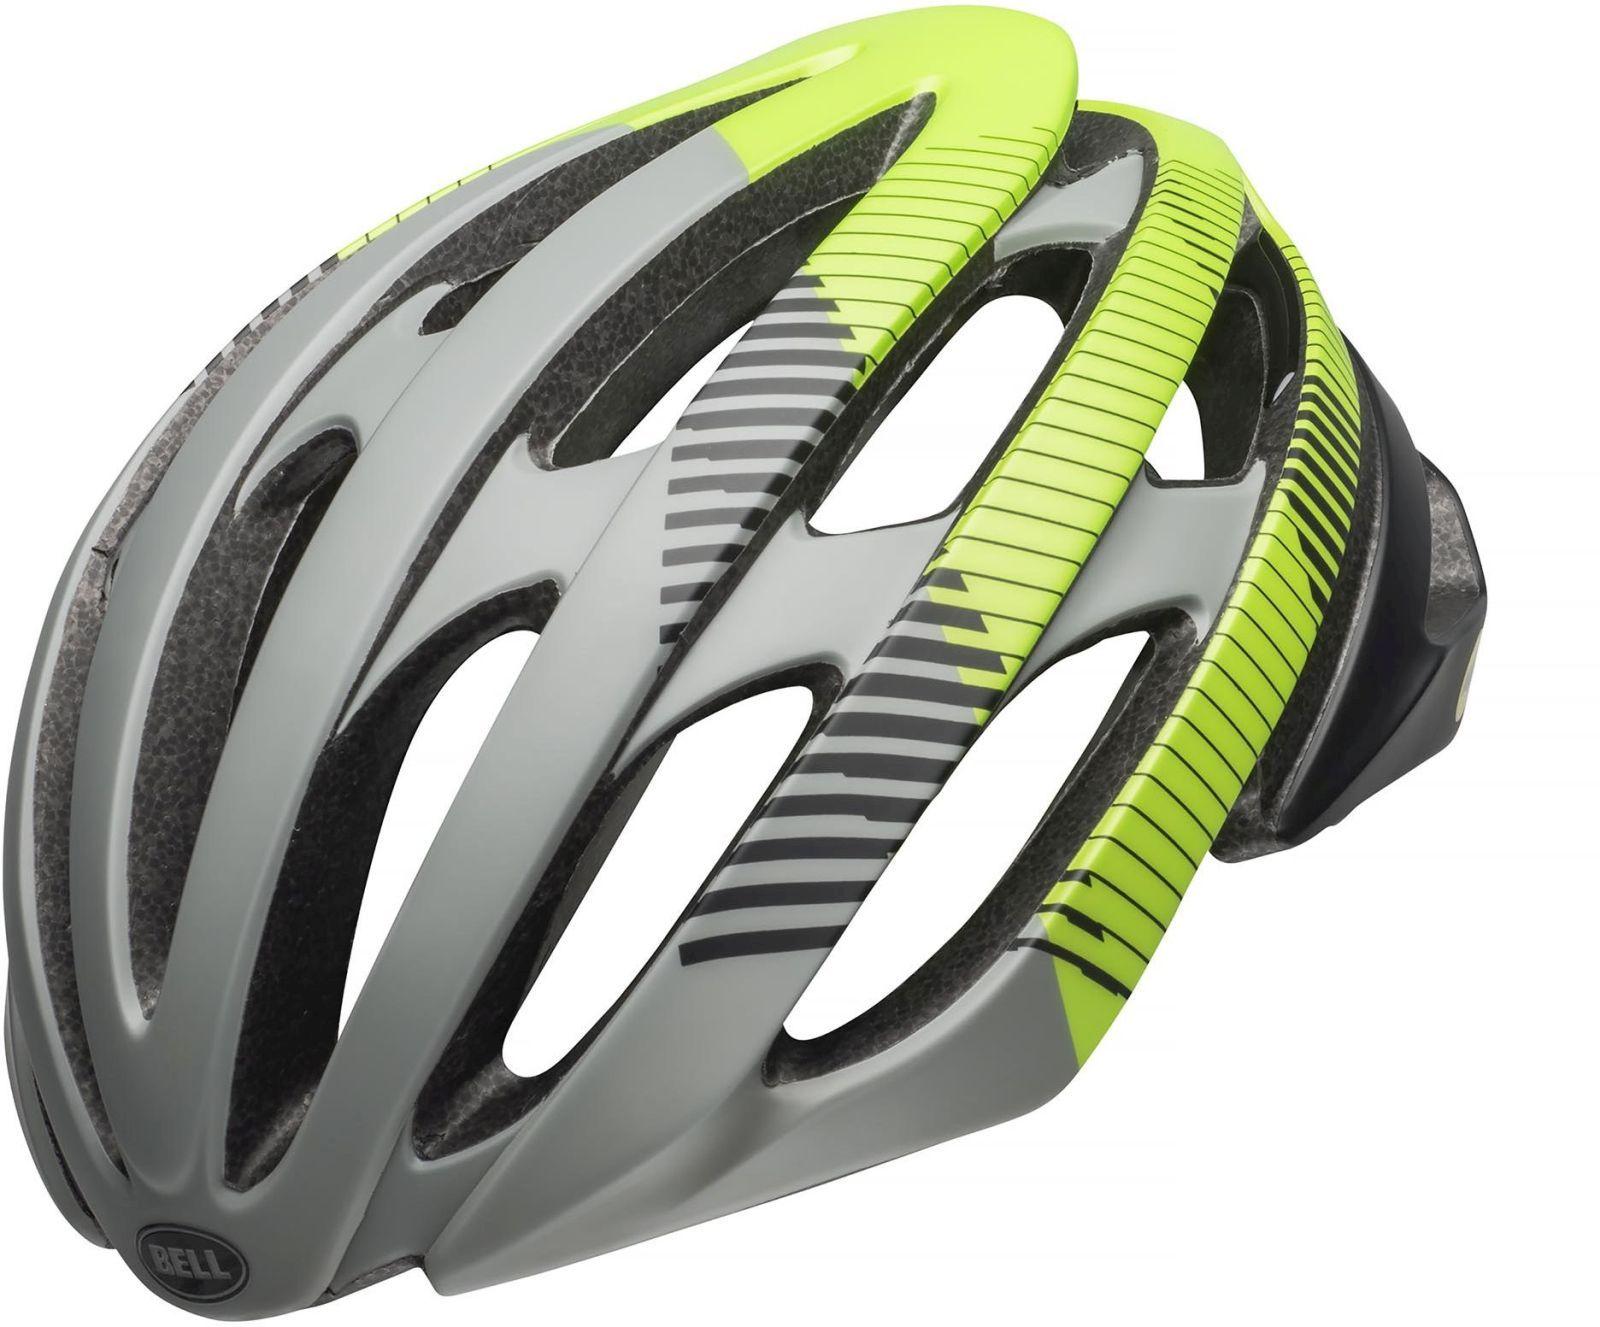 Cyklistická helma Bell Stratus - mat gray black green - Ski a Bike ... 6bcf737584b